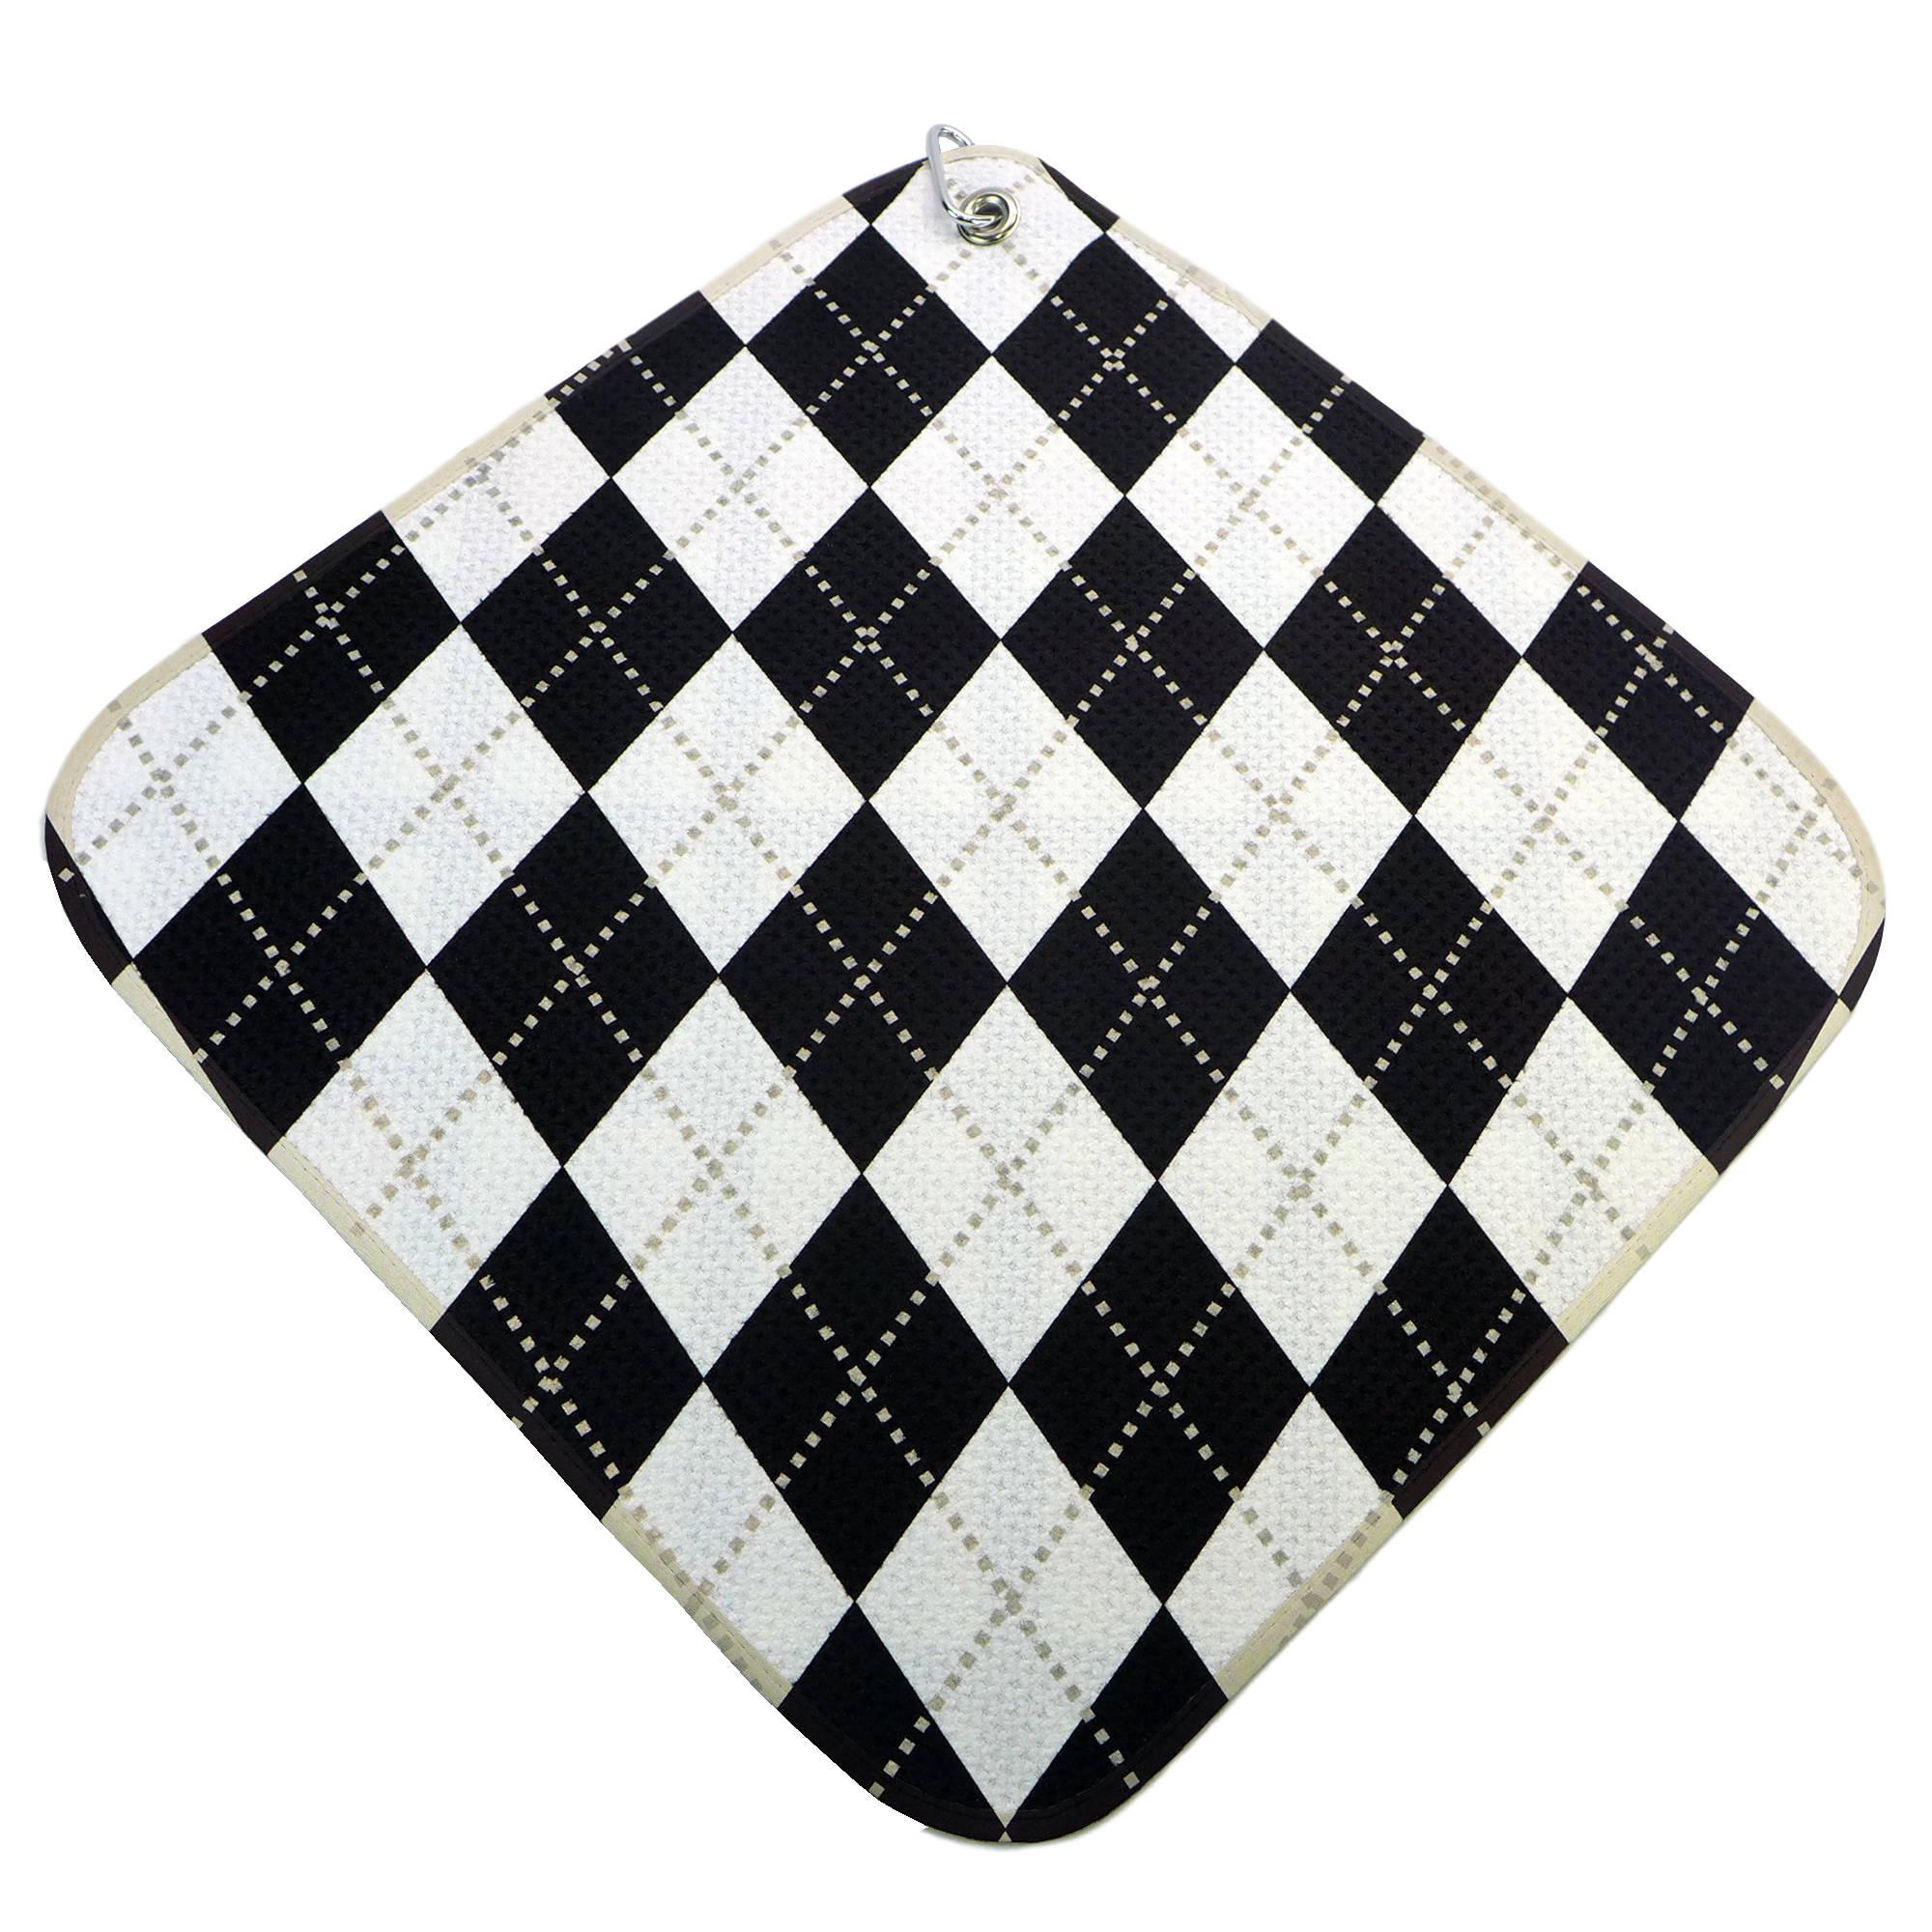 Womens Black And White Argyle Microfiber Golf Towel Etsy Standard Zoom